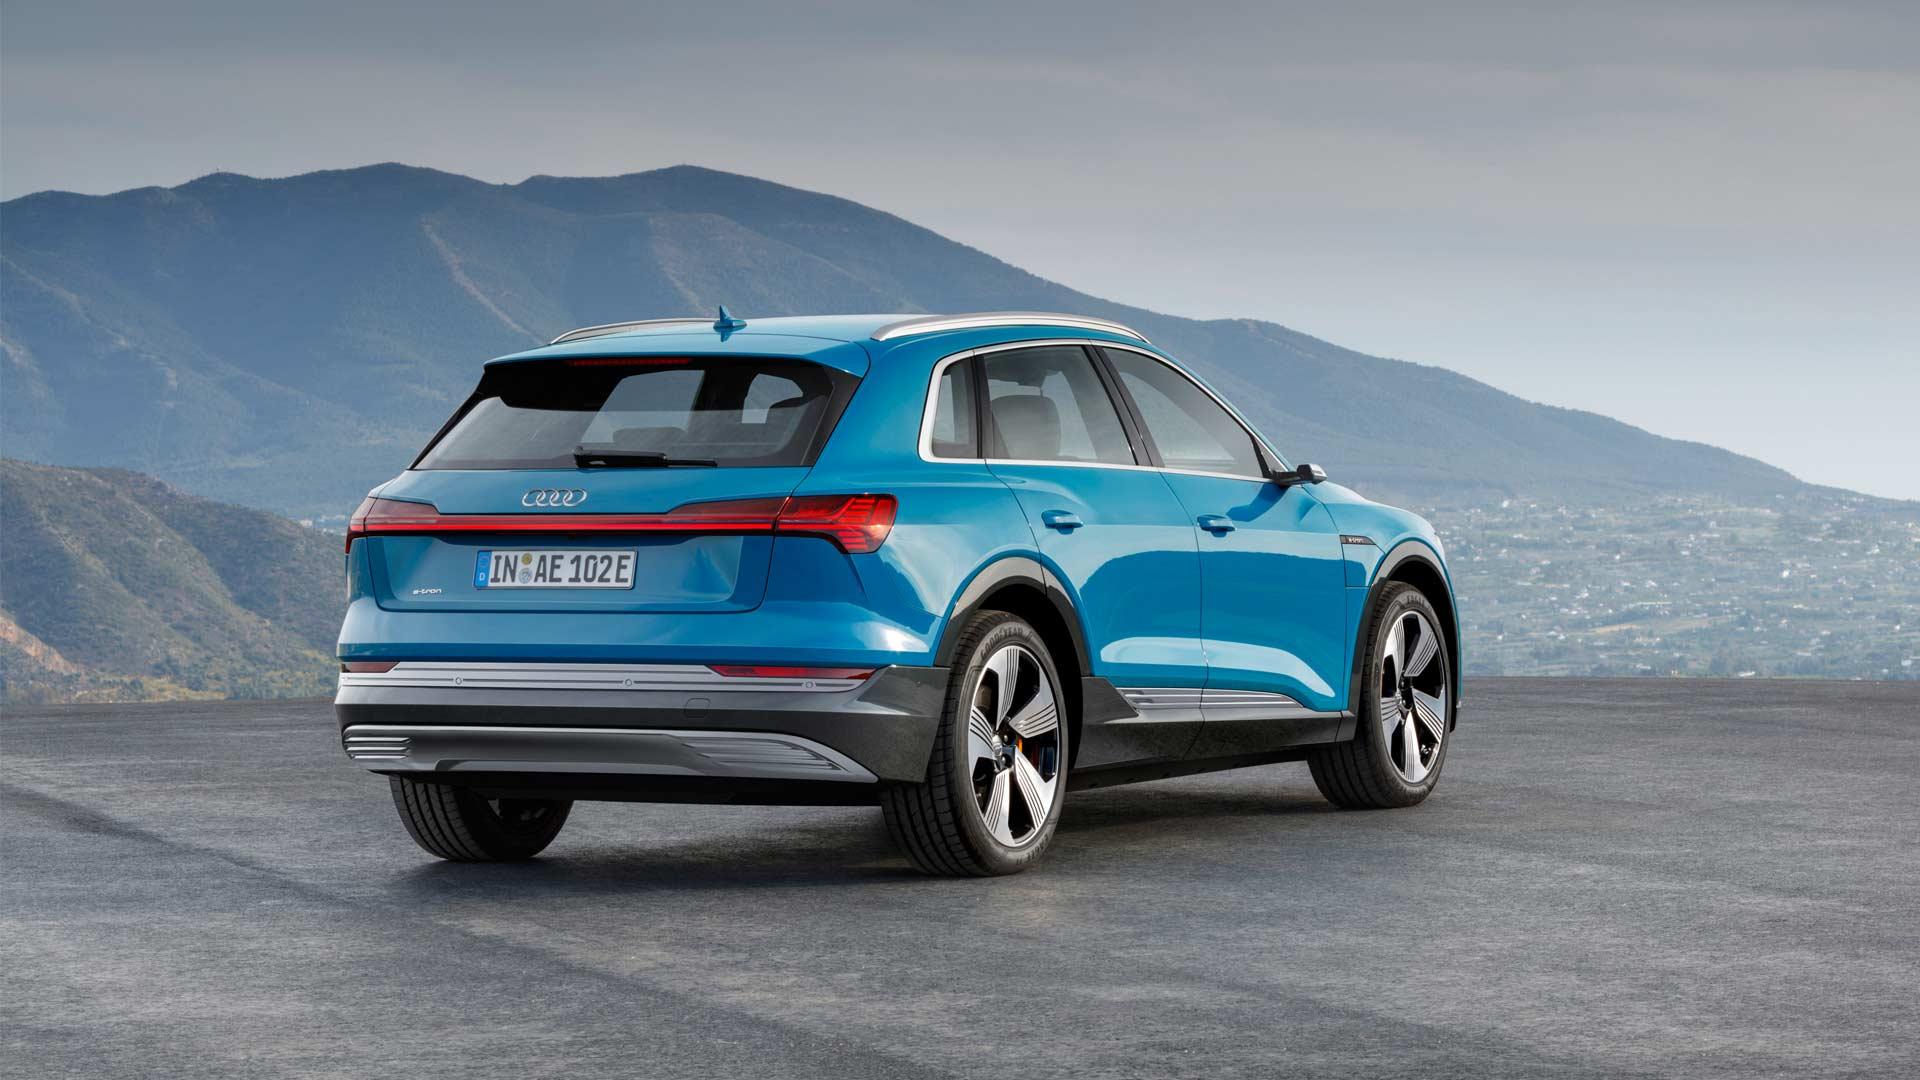 All-electric Audi e-tron SUV ready for European customers ...